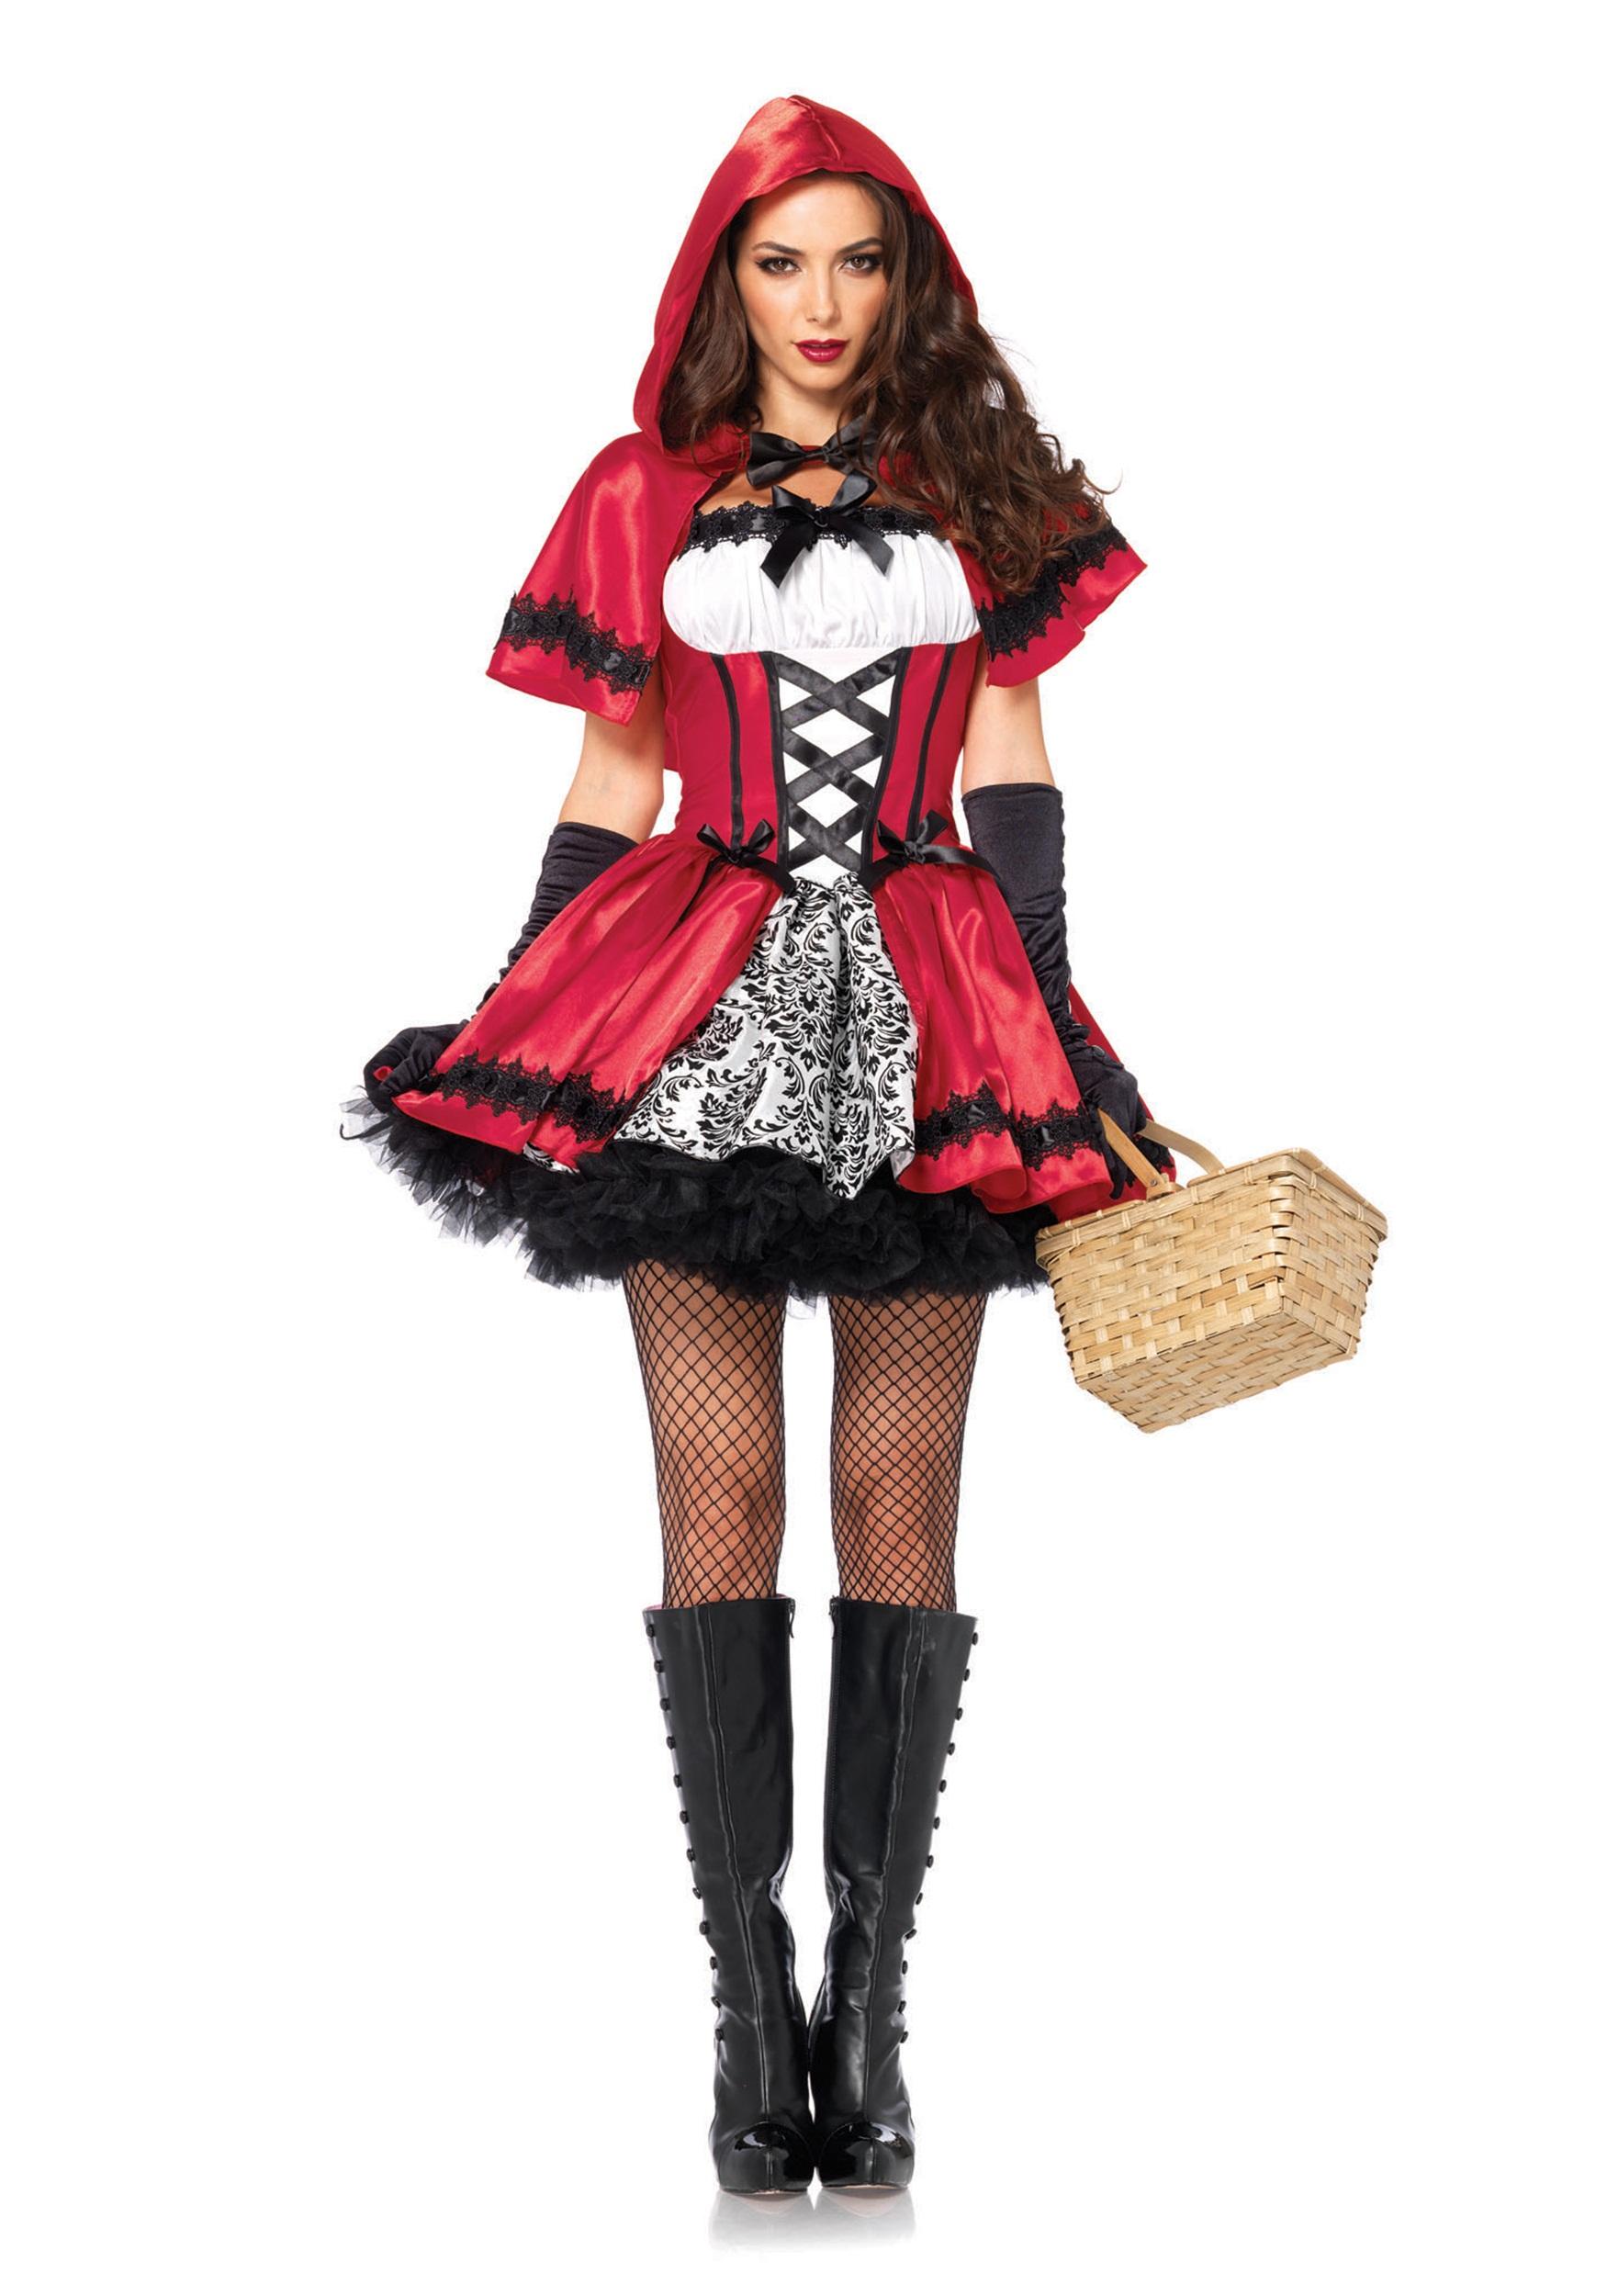 Little Red Riding Hood Halloween Costume